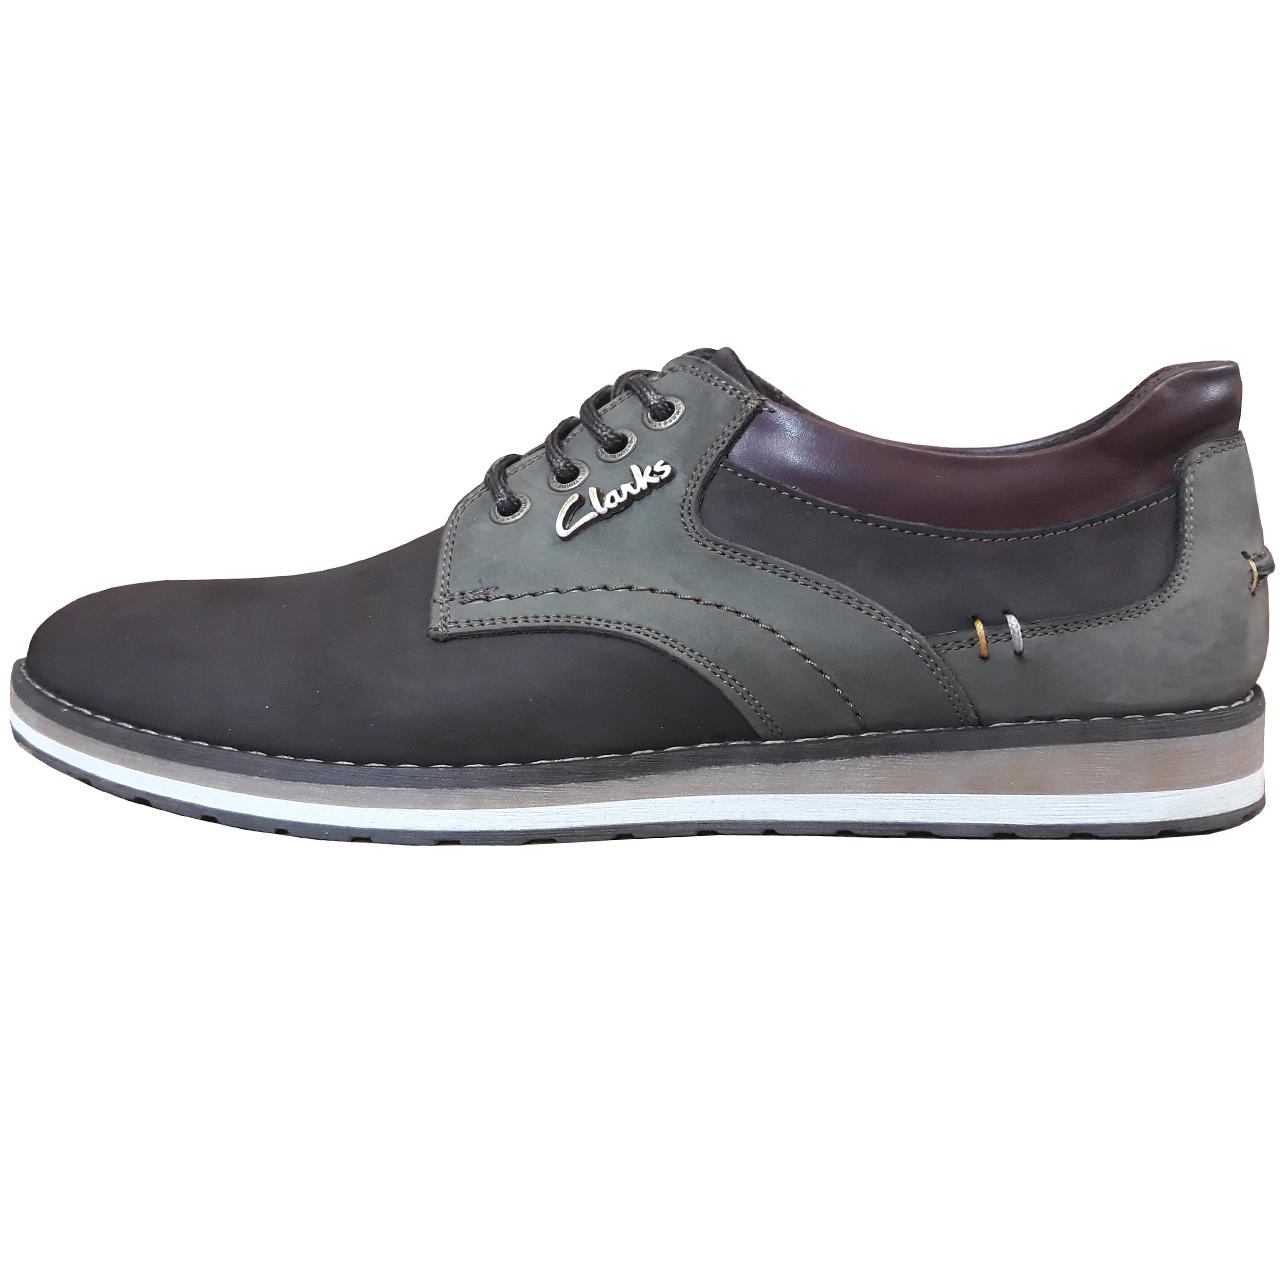 کفش مردانه چرم طبیعی کلارکس مدل هورس کد 310